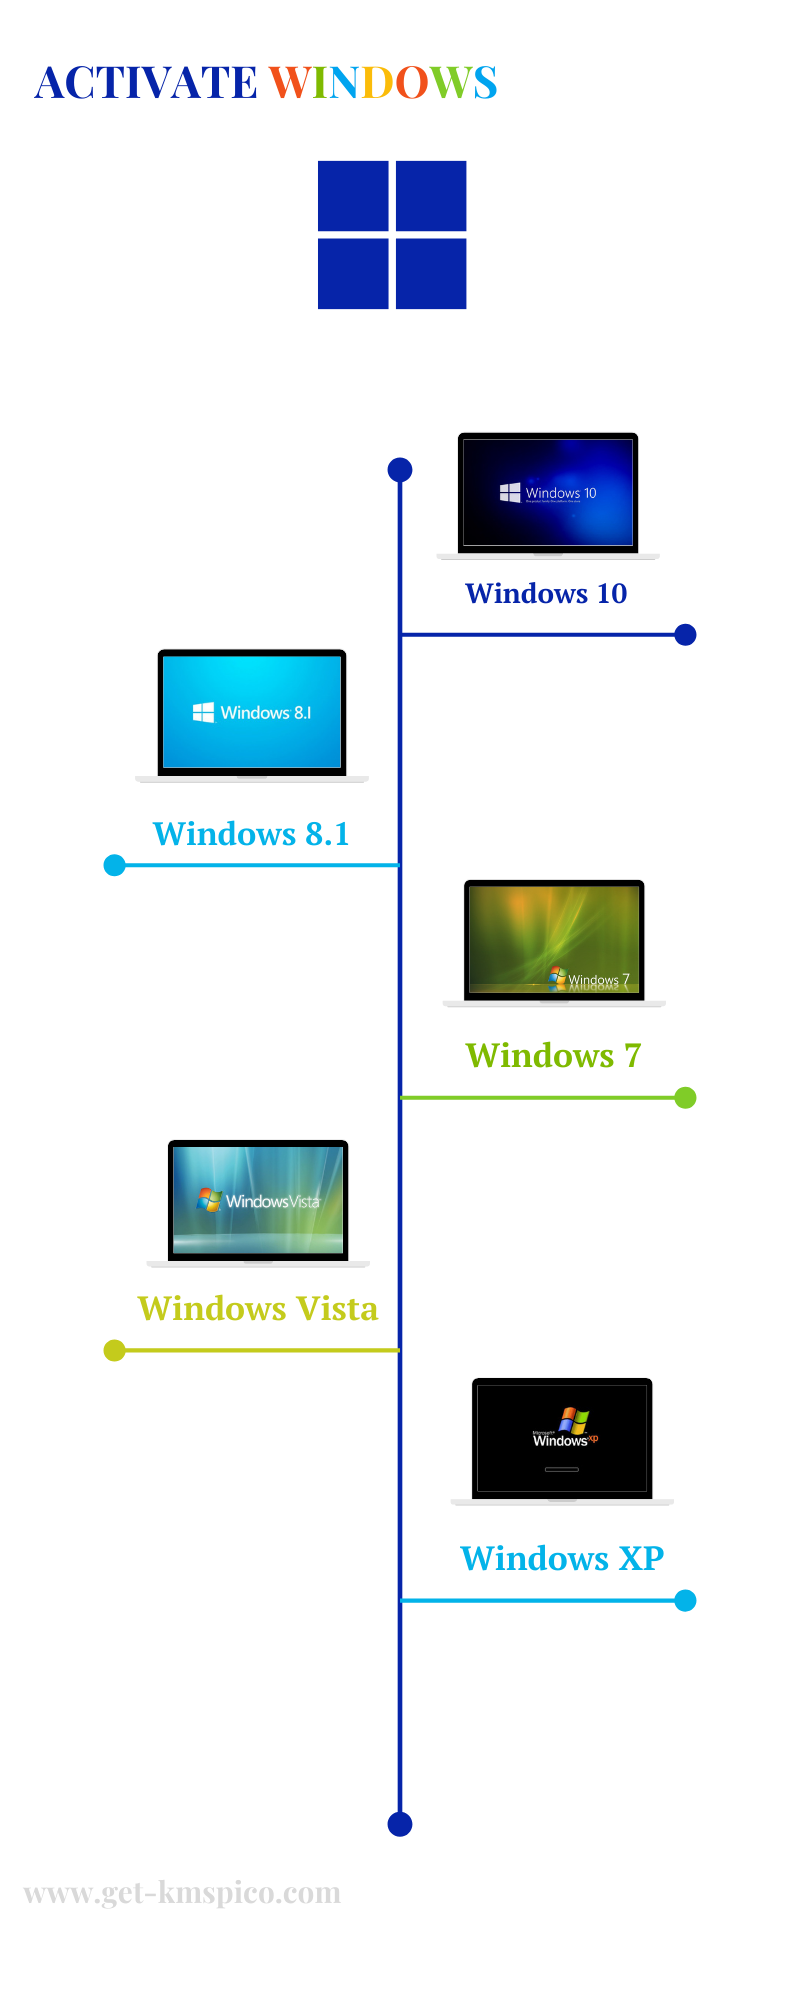 Activate-Windows-Infographic